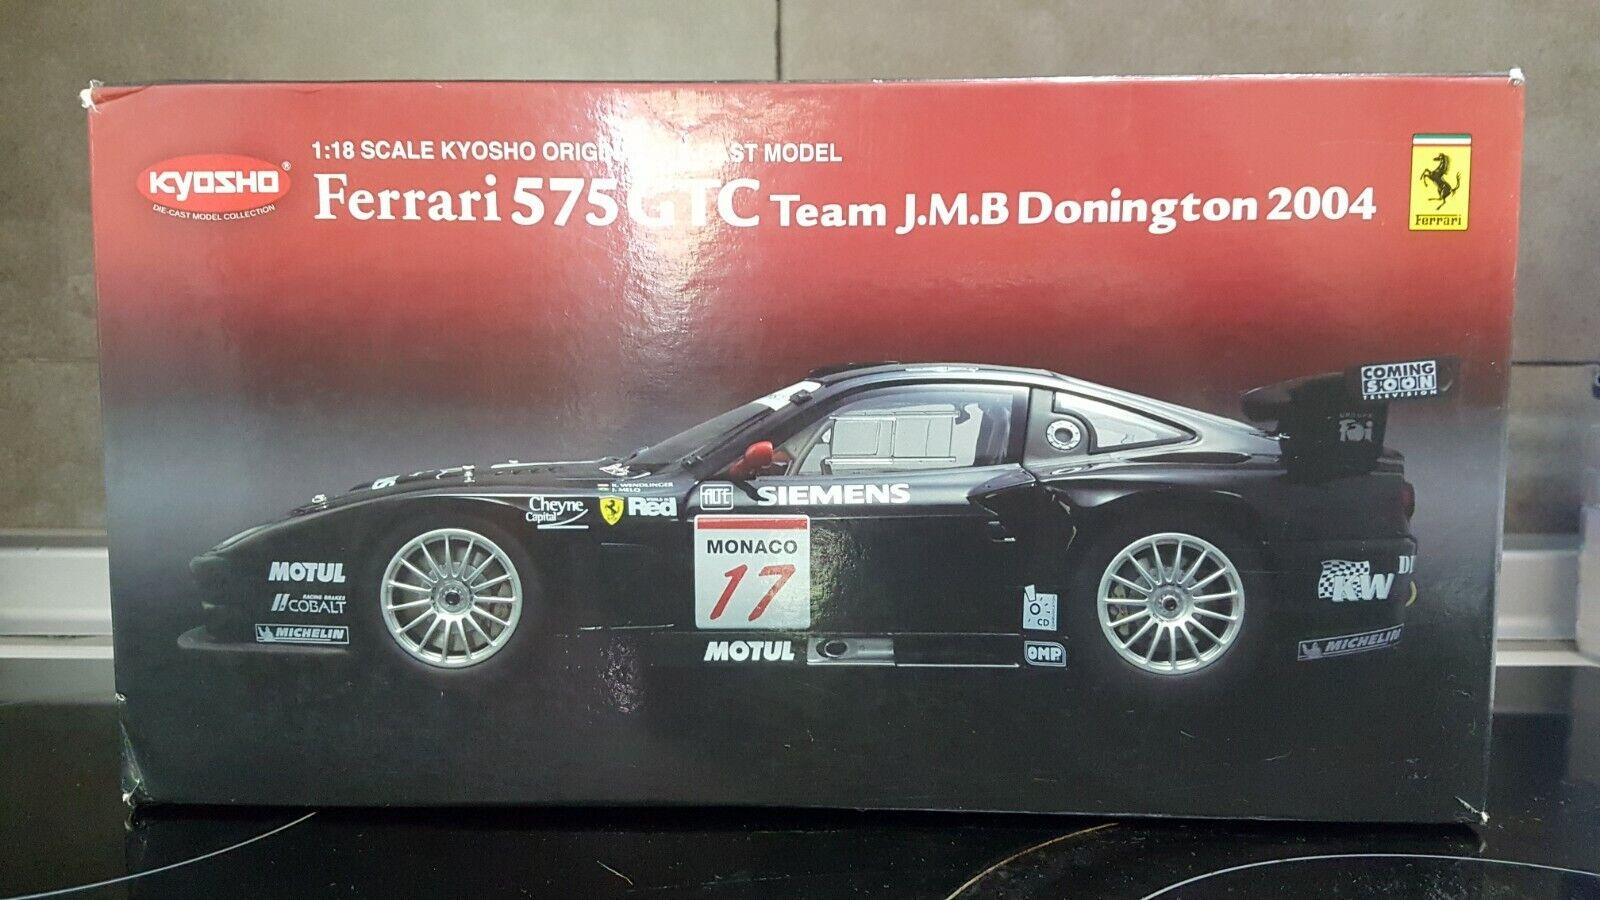 1.18 Ferrari 575 GTC convoy jmb donington 2004 (kyosho)